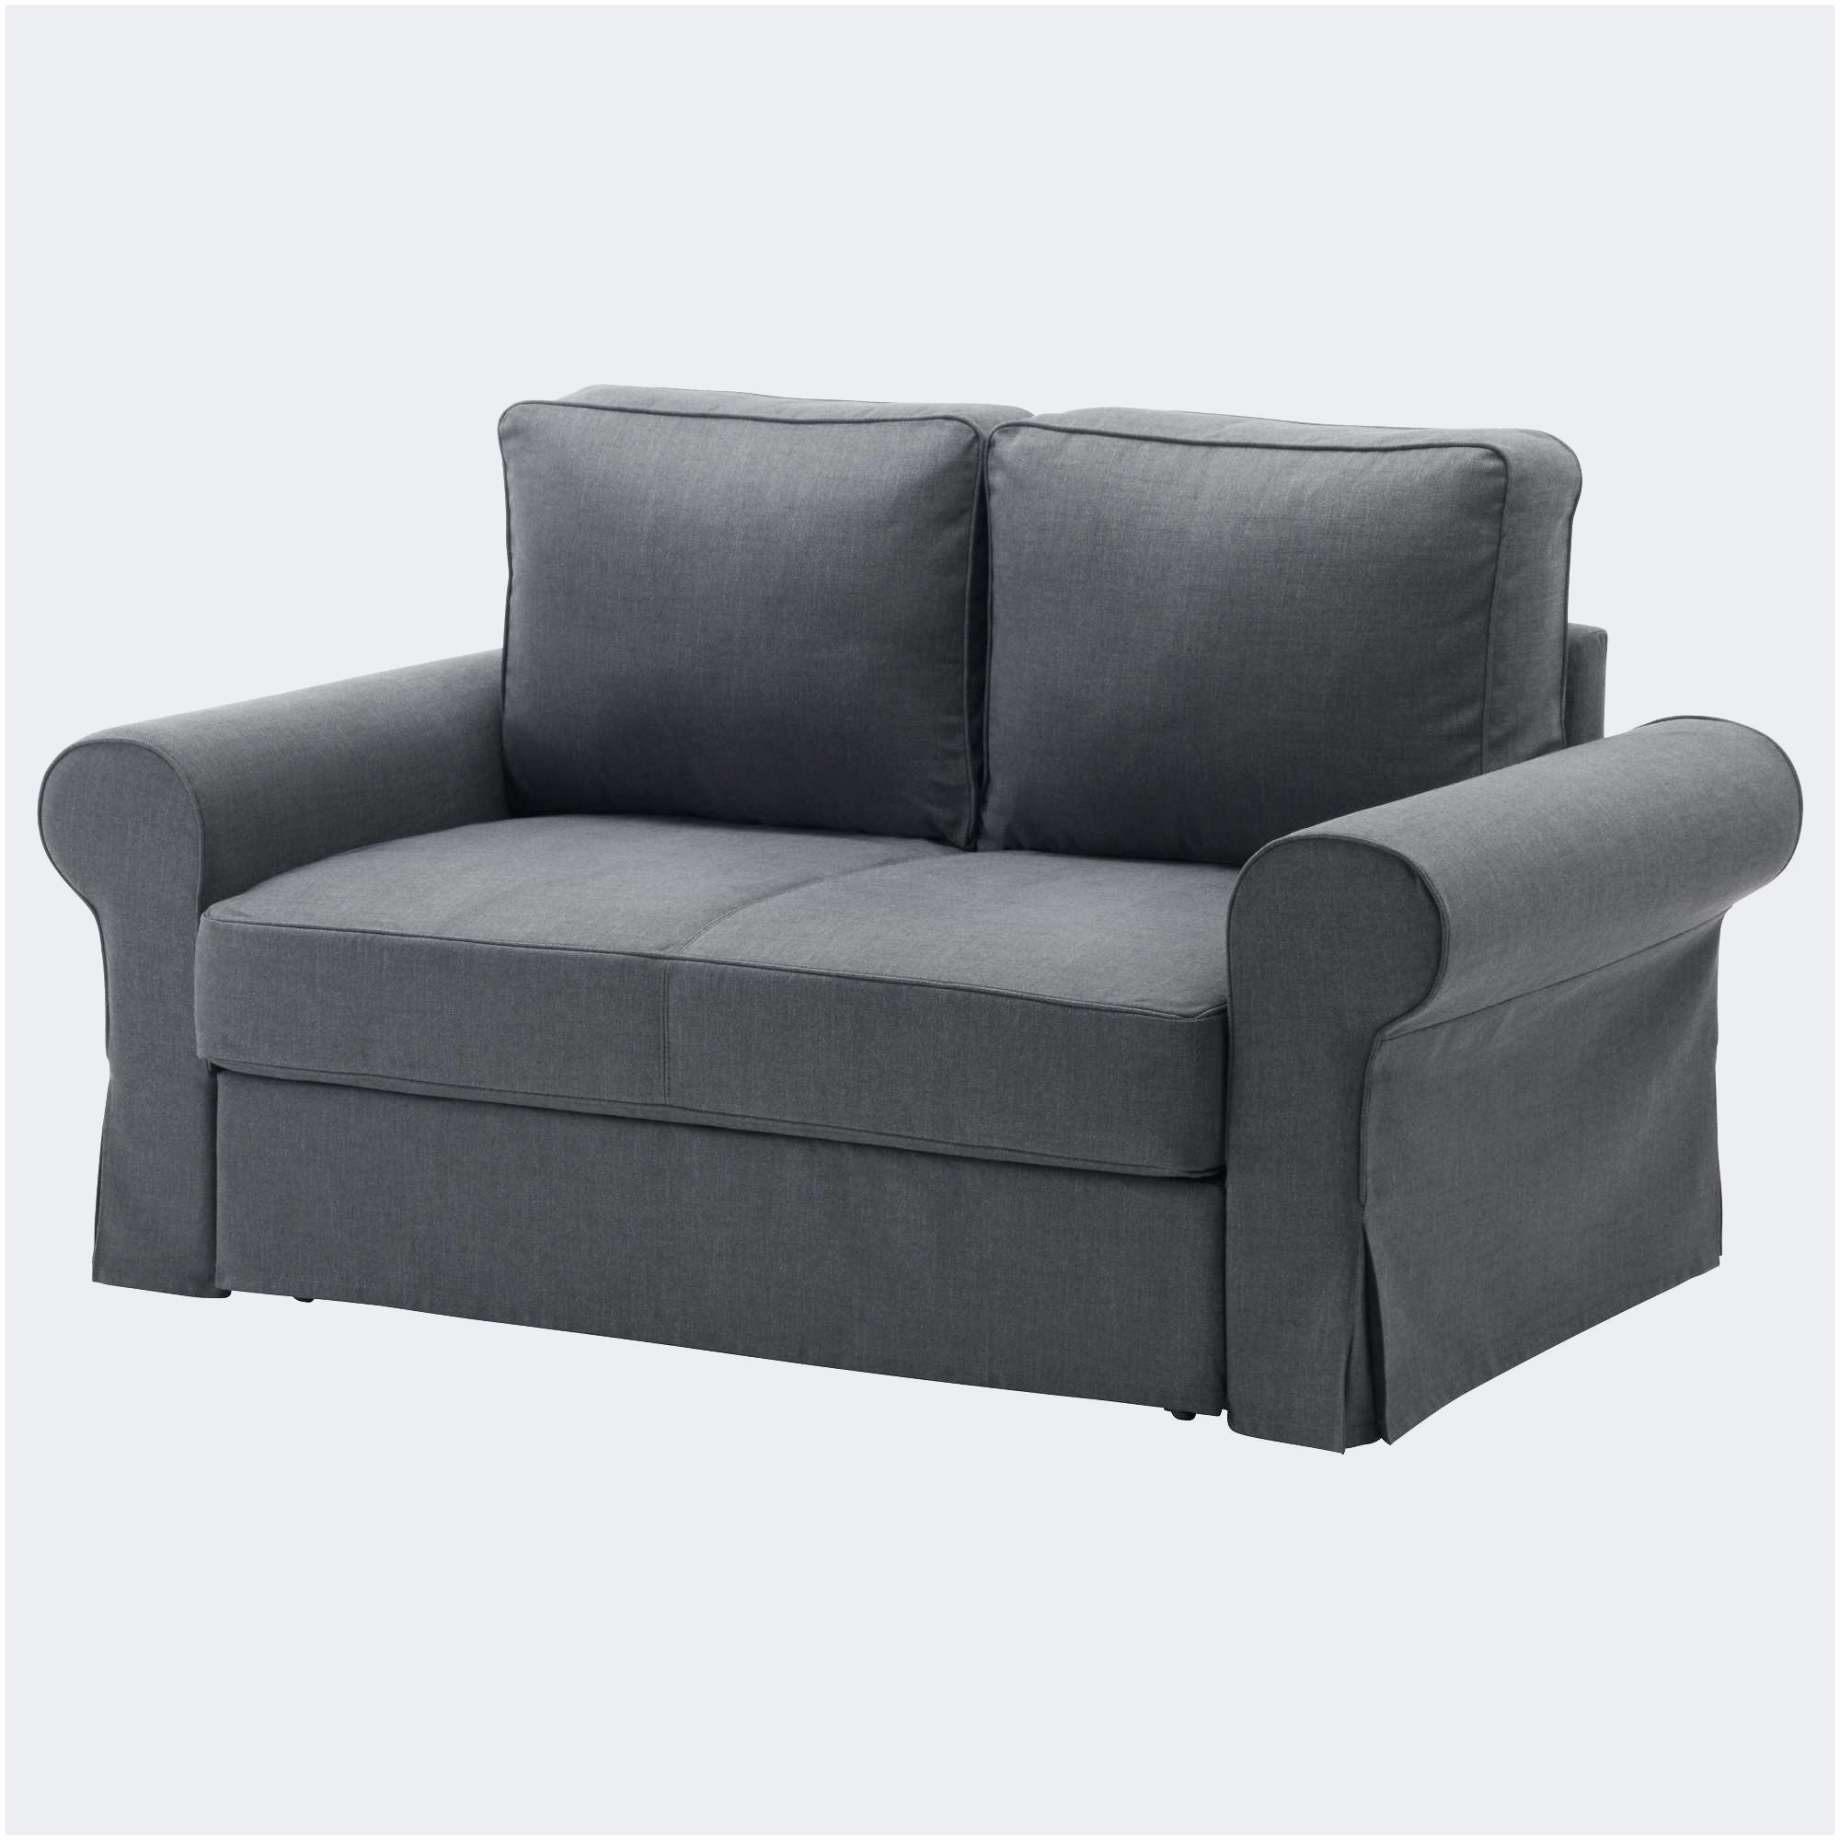 Canapé Lit Simili Cuir Charmant 67 Canapé Convertible Simili Cuir Idee Jongor4hire